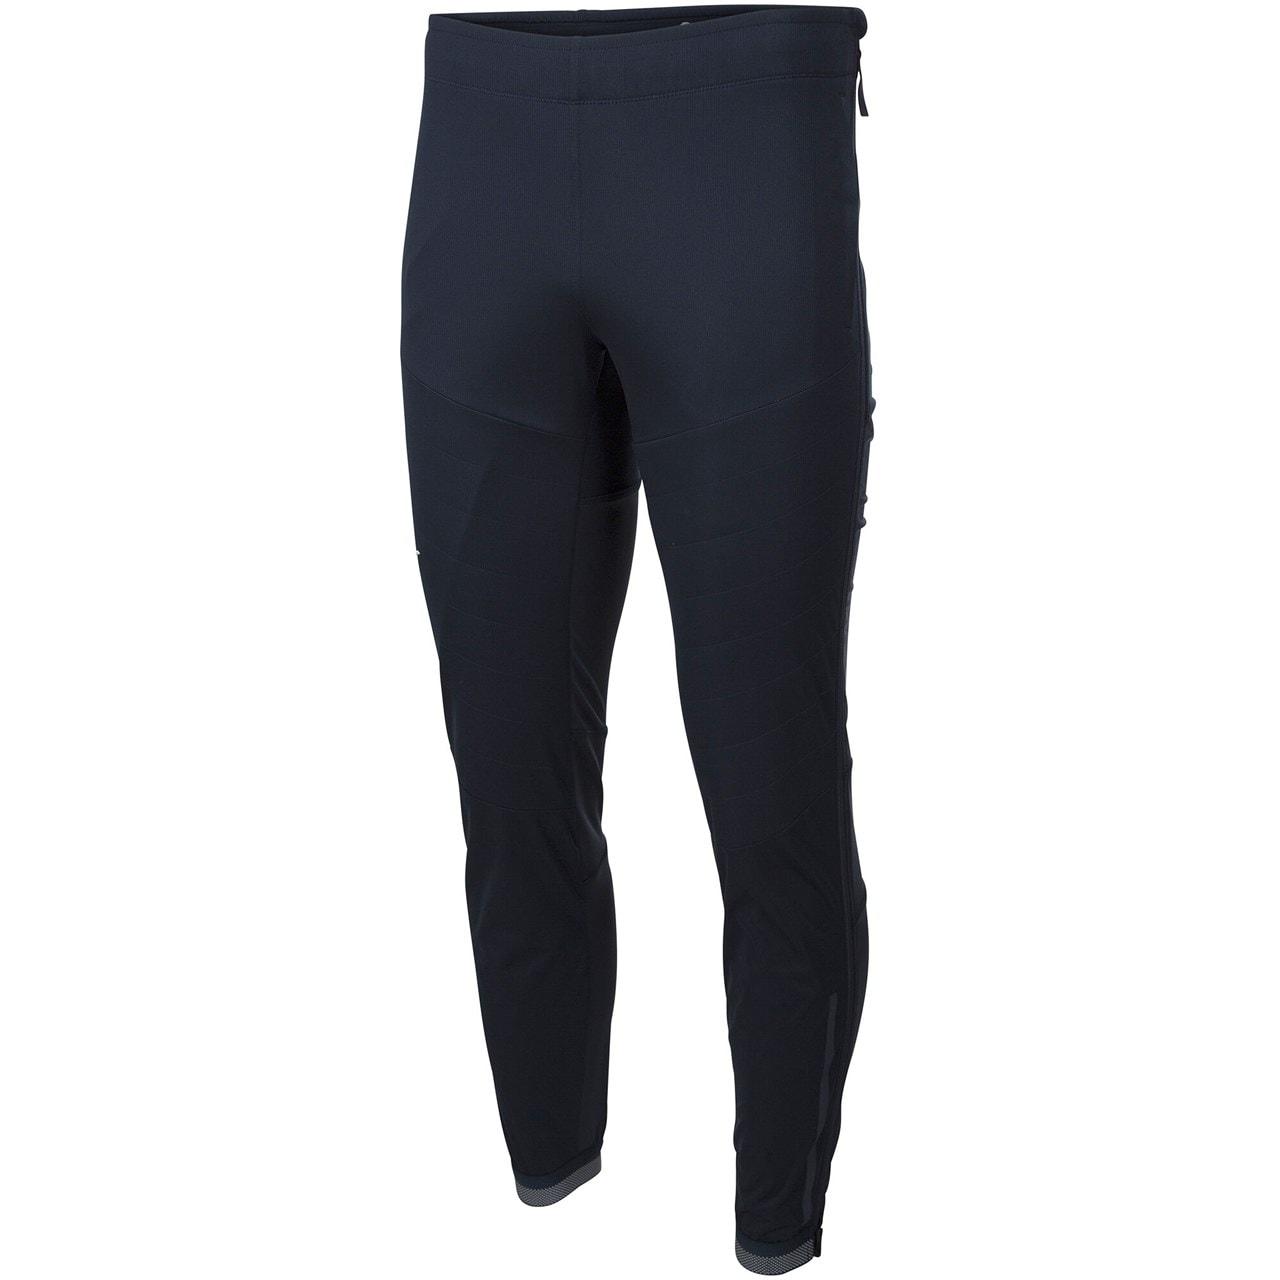 Swix Blizzard XC Pants, M's